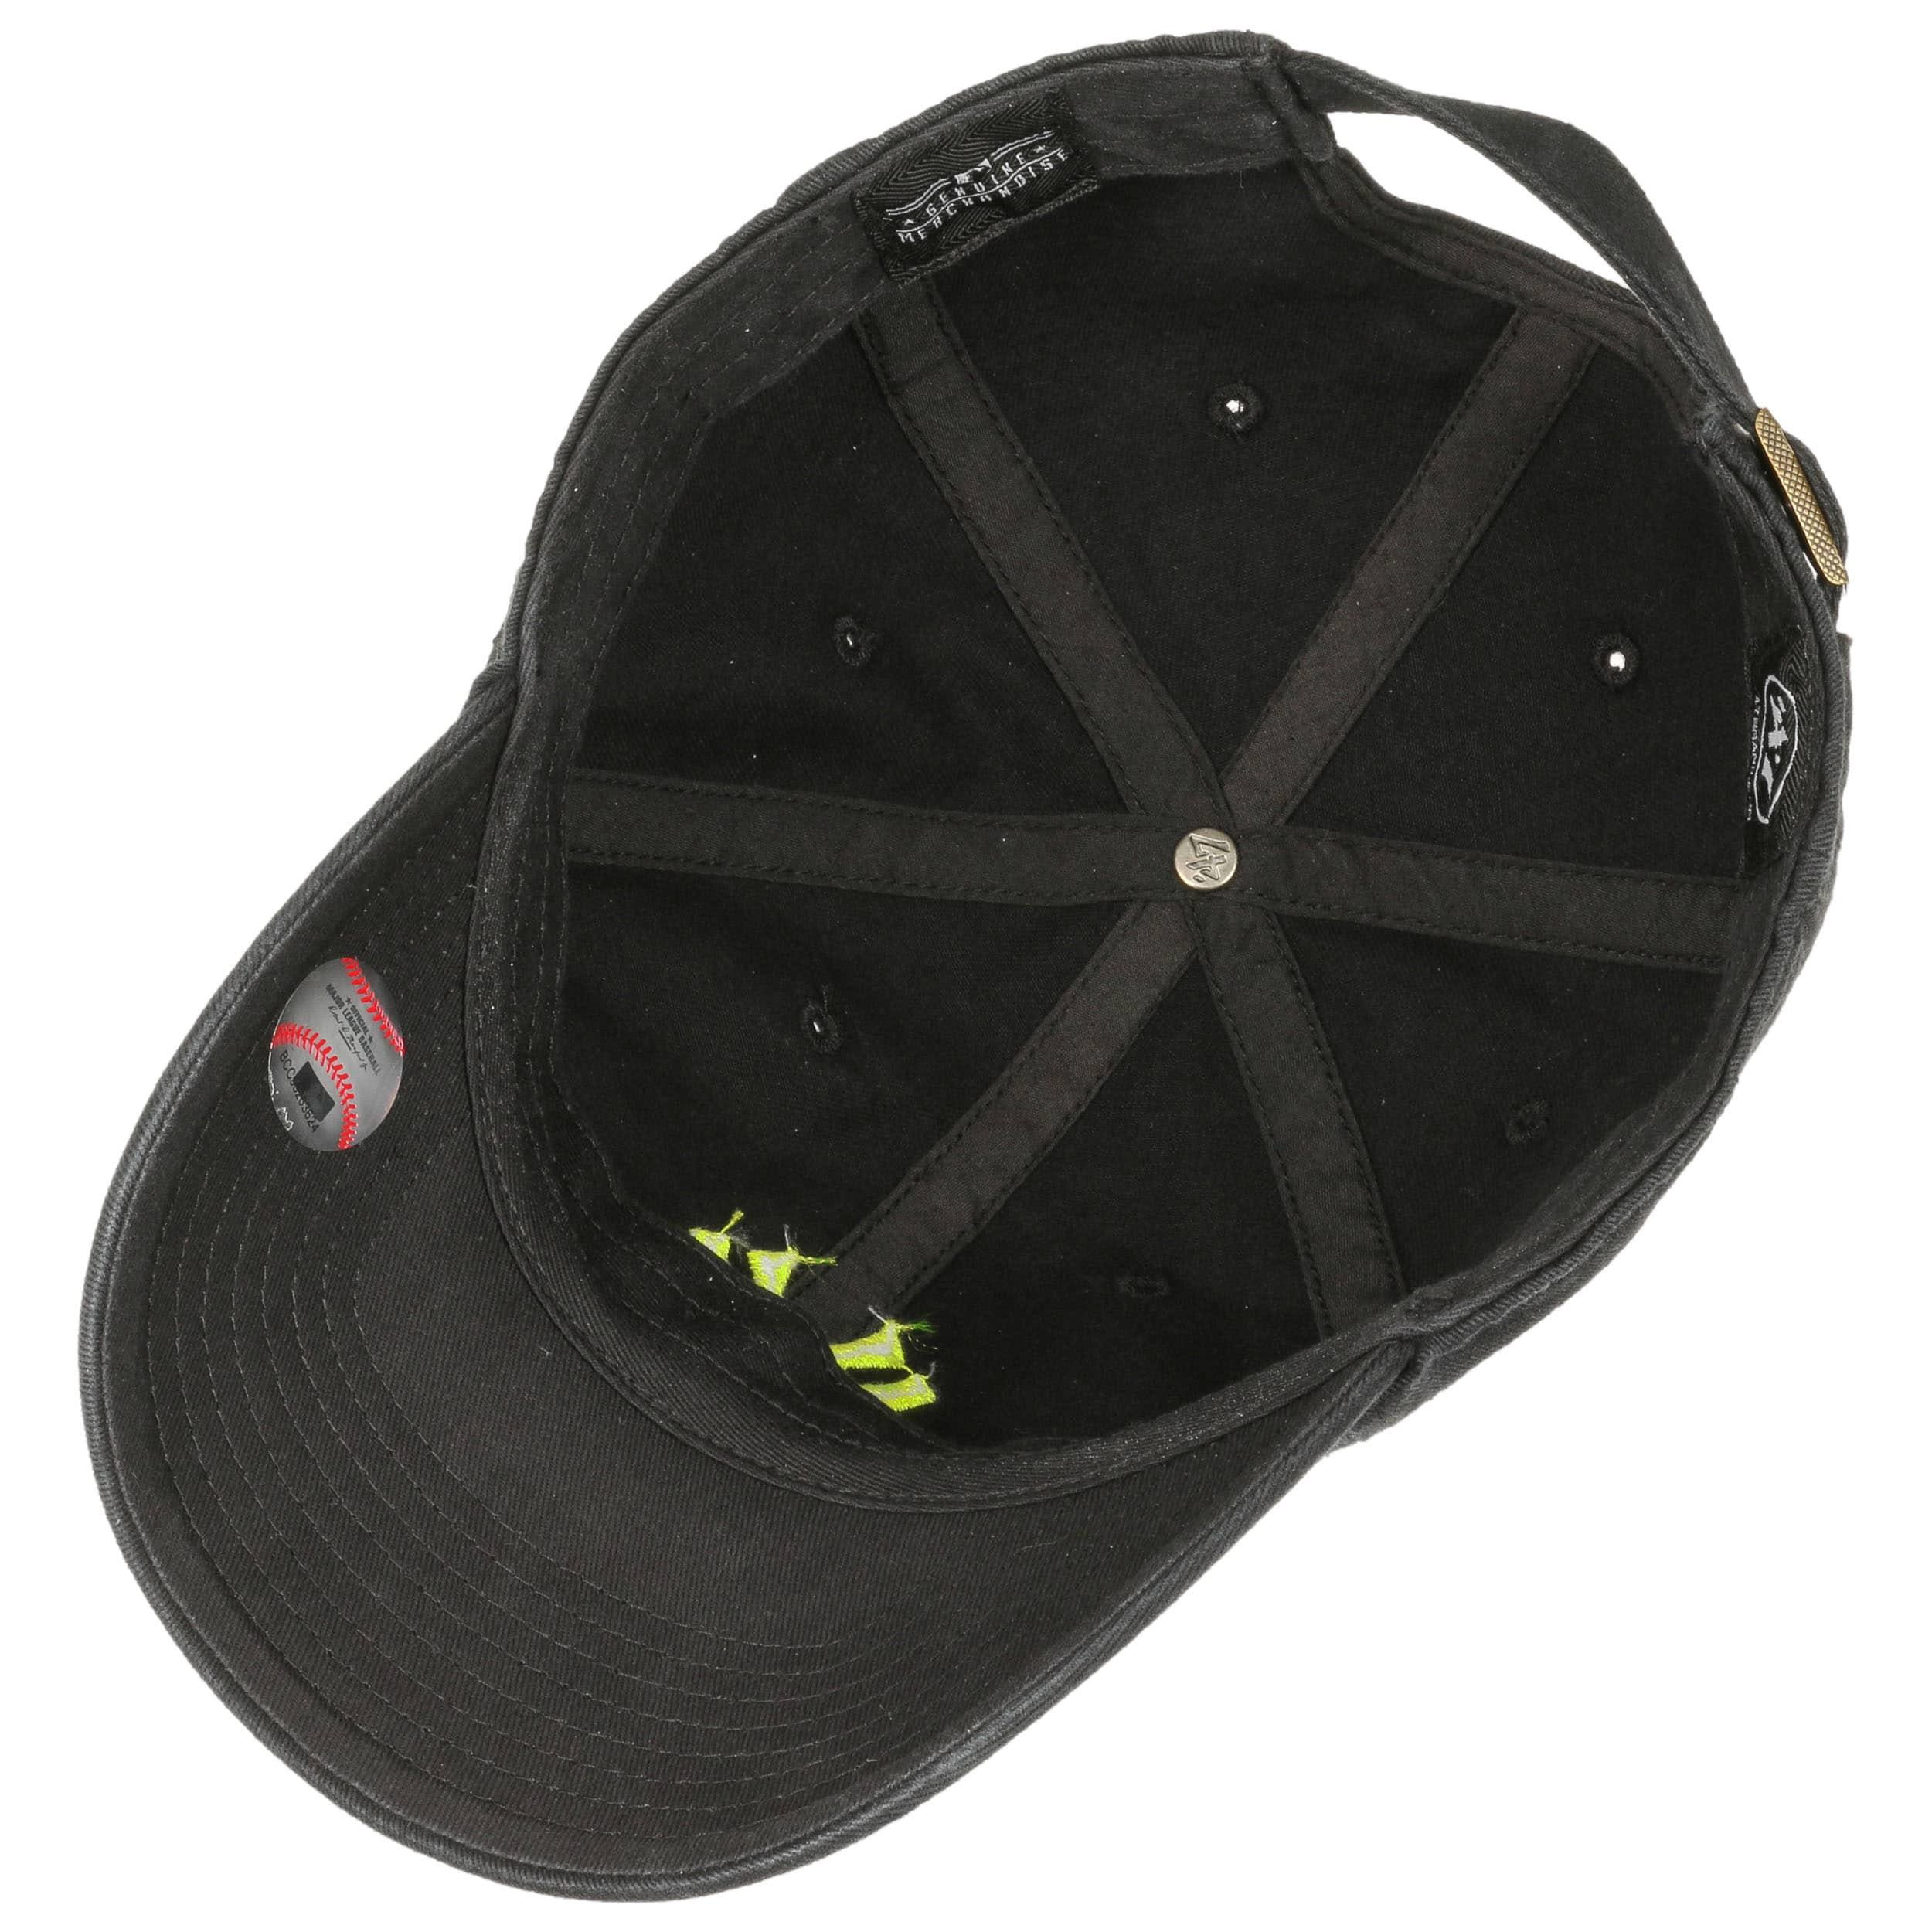 34d61309310 ... Clean Up Yankees Neon Cap by 47 Brand - black-pink 2 ...